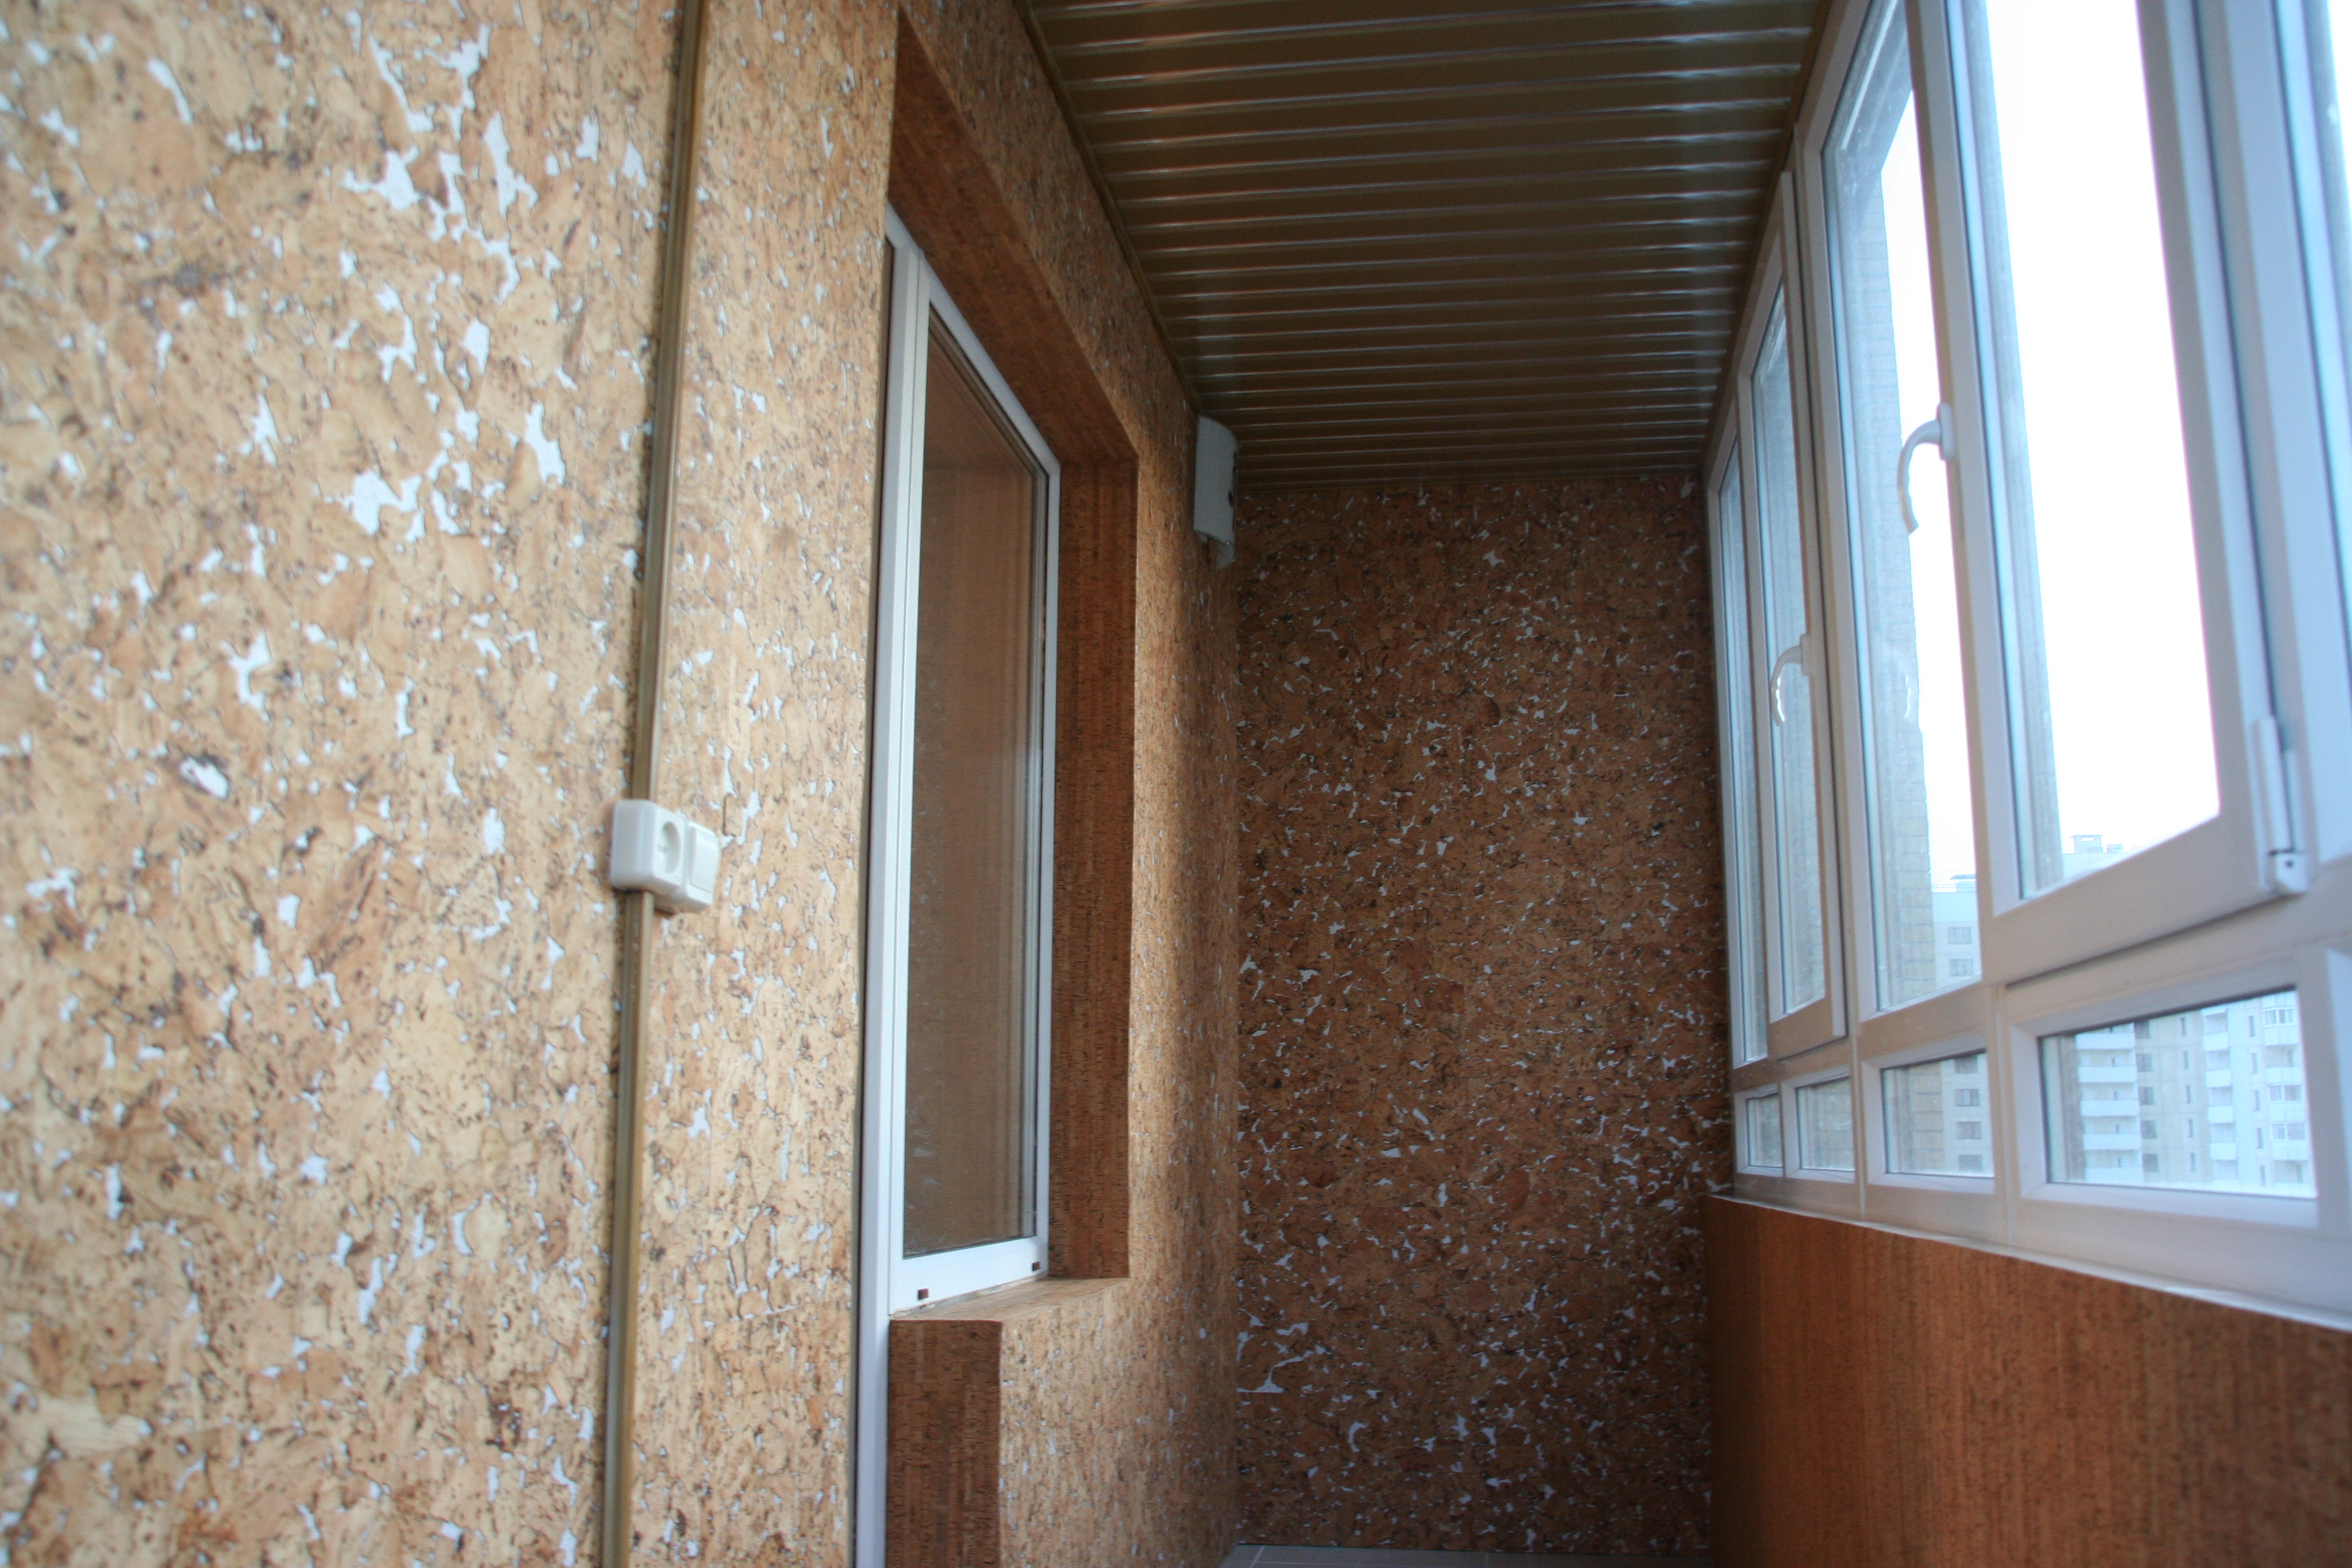 Материалы для отделки балкона: отделка пола, стен на лоджии.